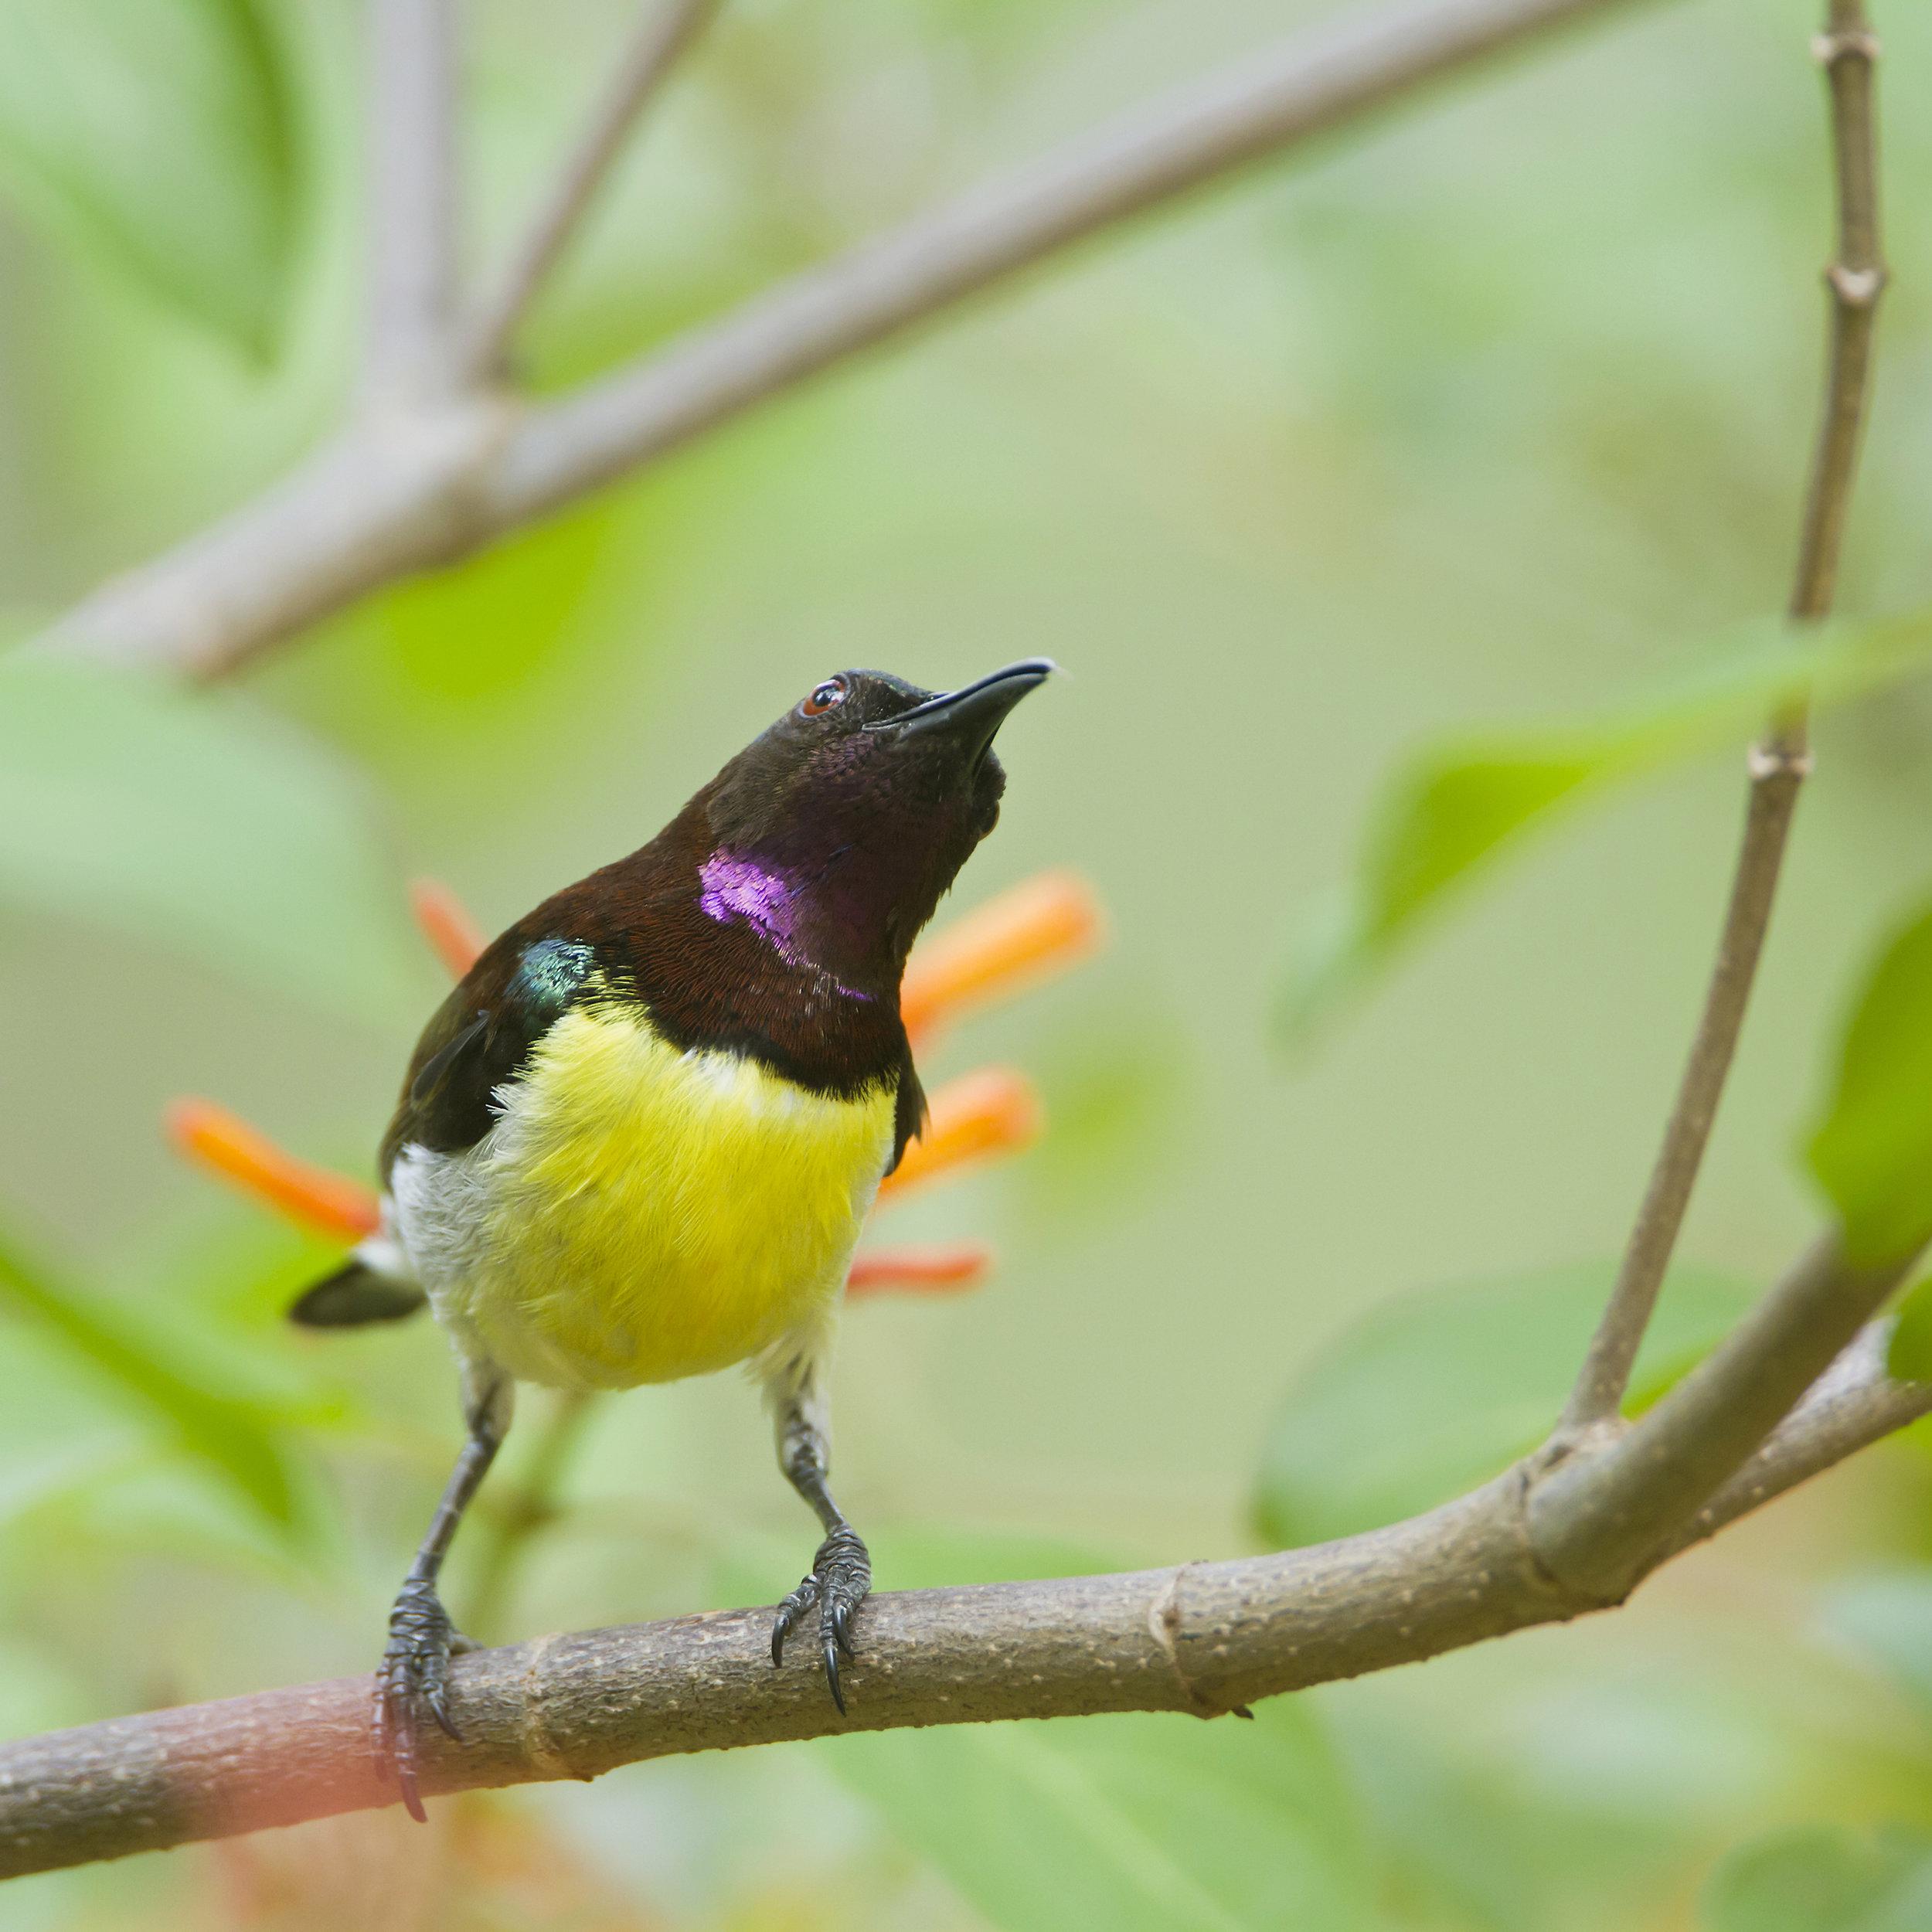 288377810 - Purple-rumped sunbird in Minneriya national park, Sri Lanka ; specie Leptocoma zeylonica .jpg